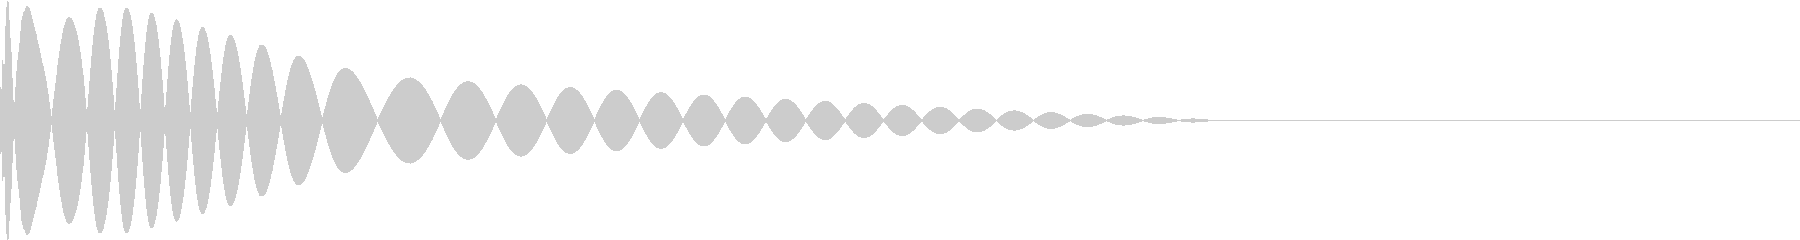 DTM Kick 18 オリジナル音源の未再生の波形